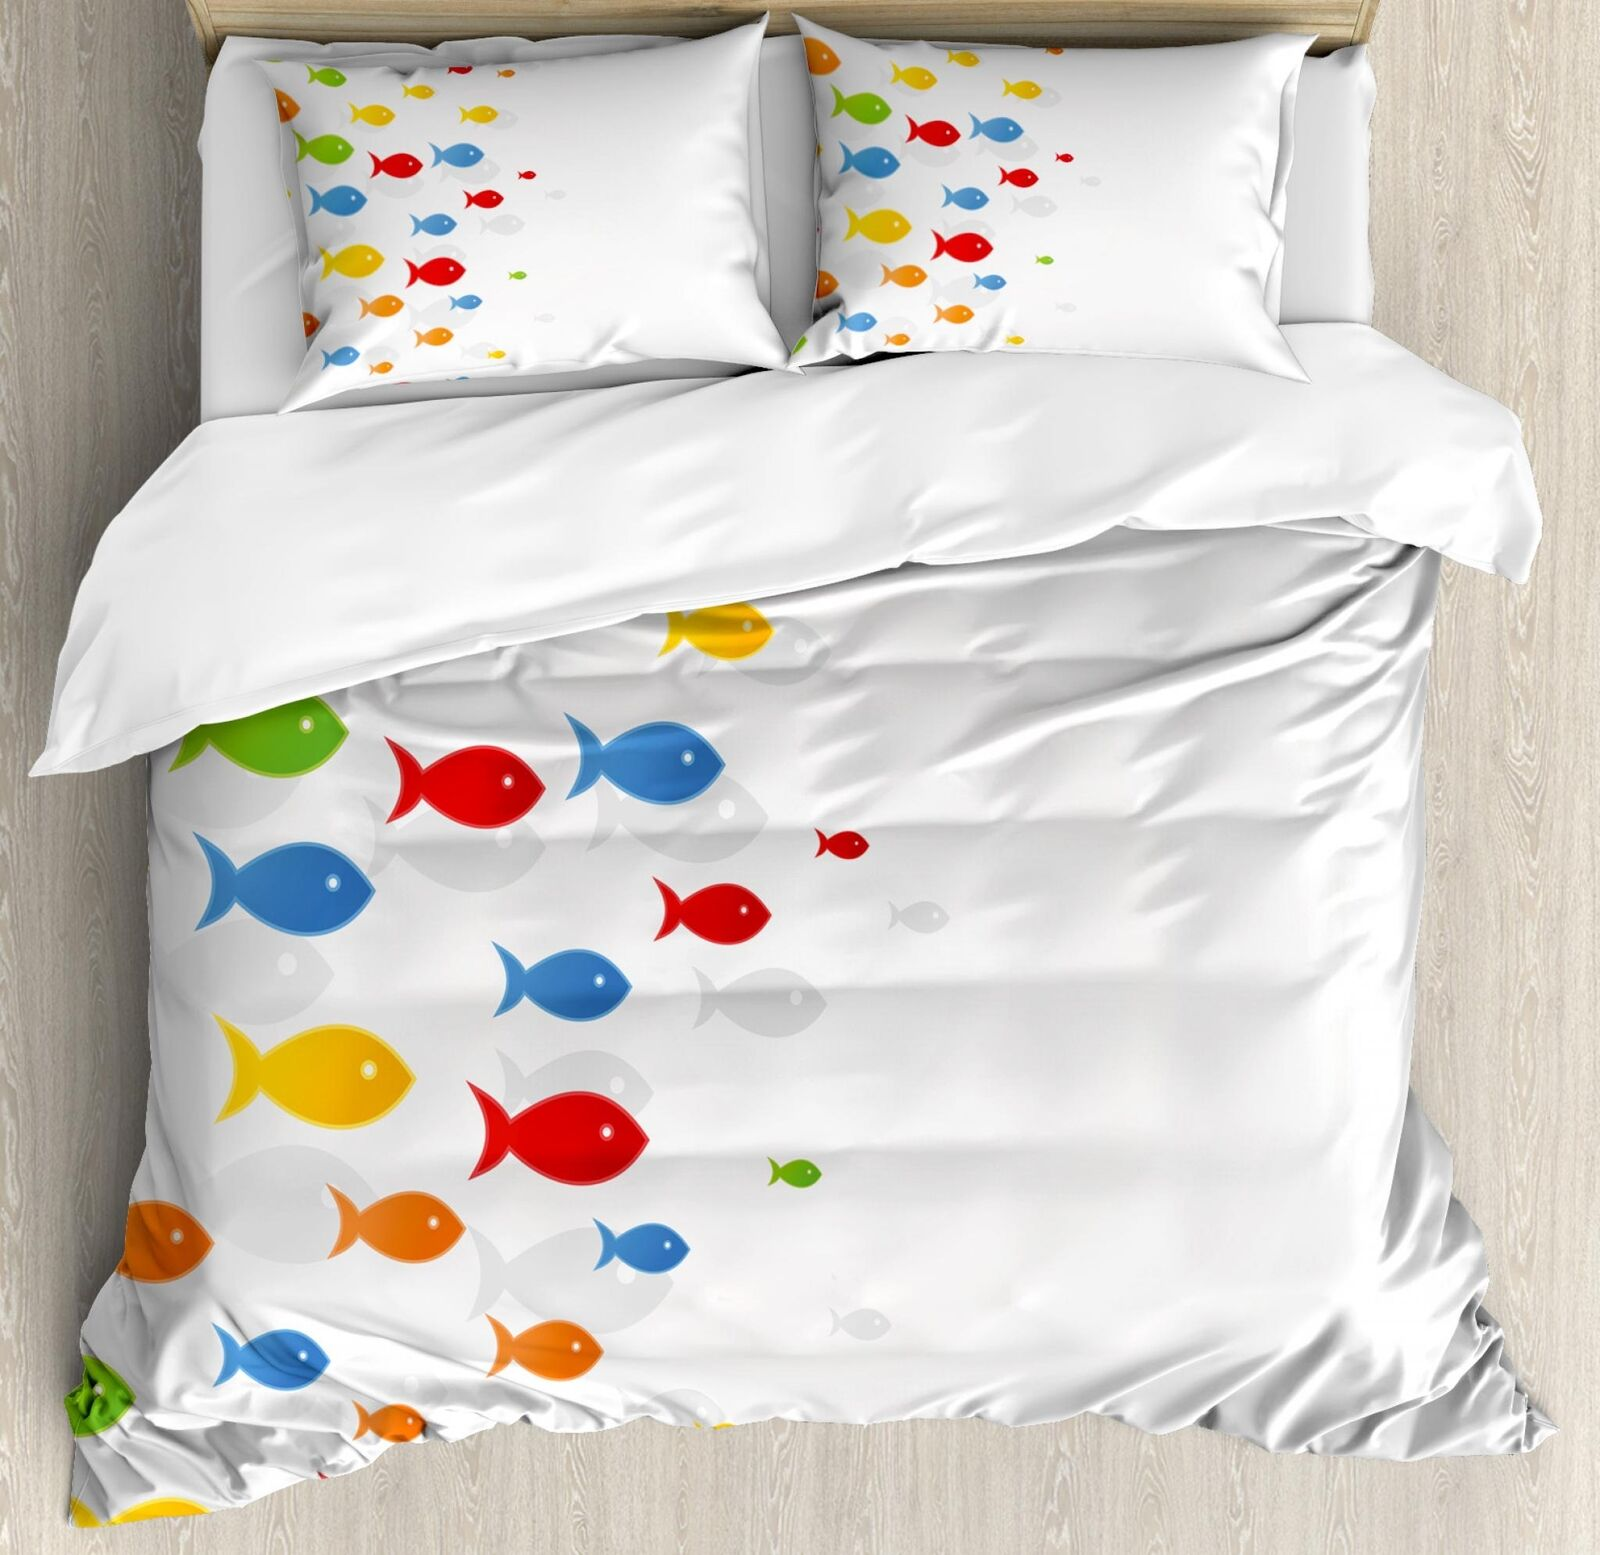 Ocean Fauna Duvet Cover Set Twin Queen King Sizes with Pillow Shams